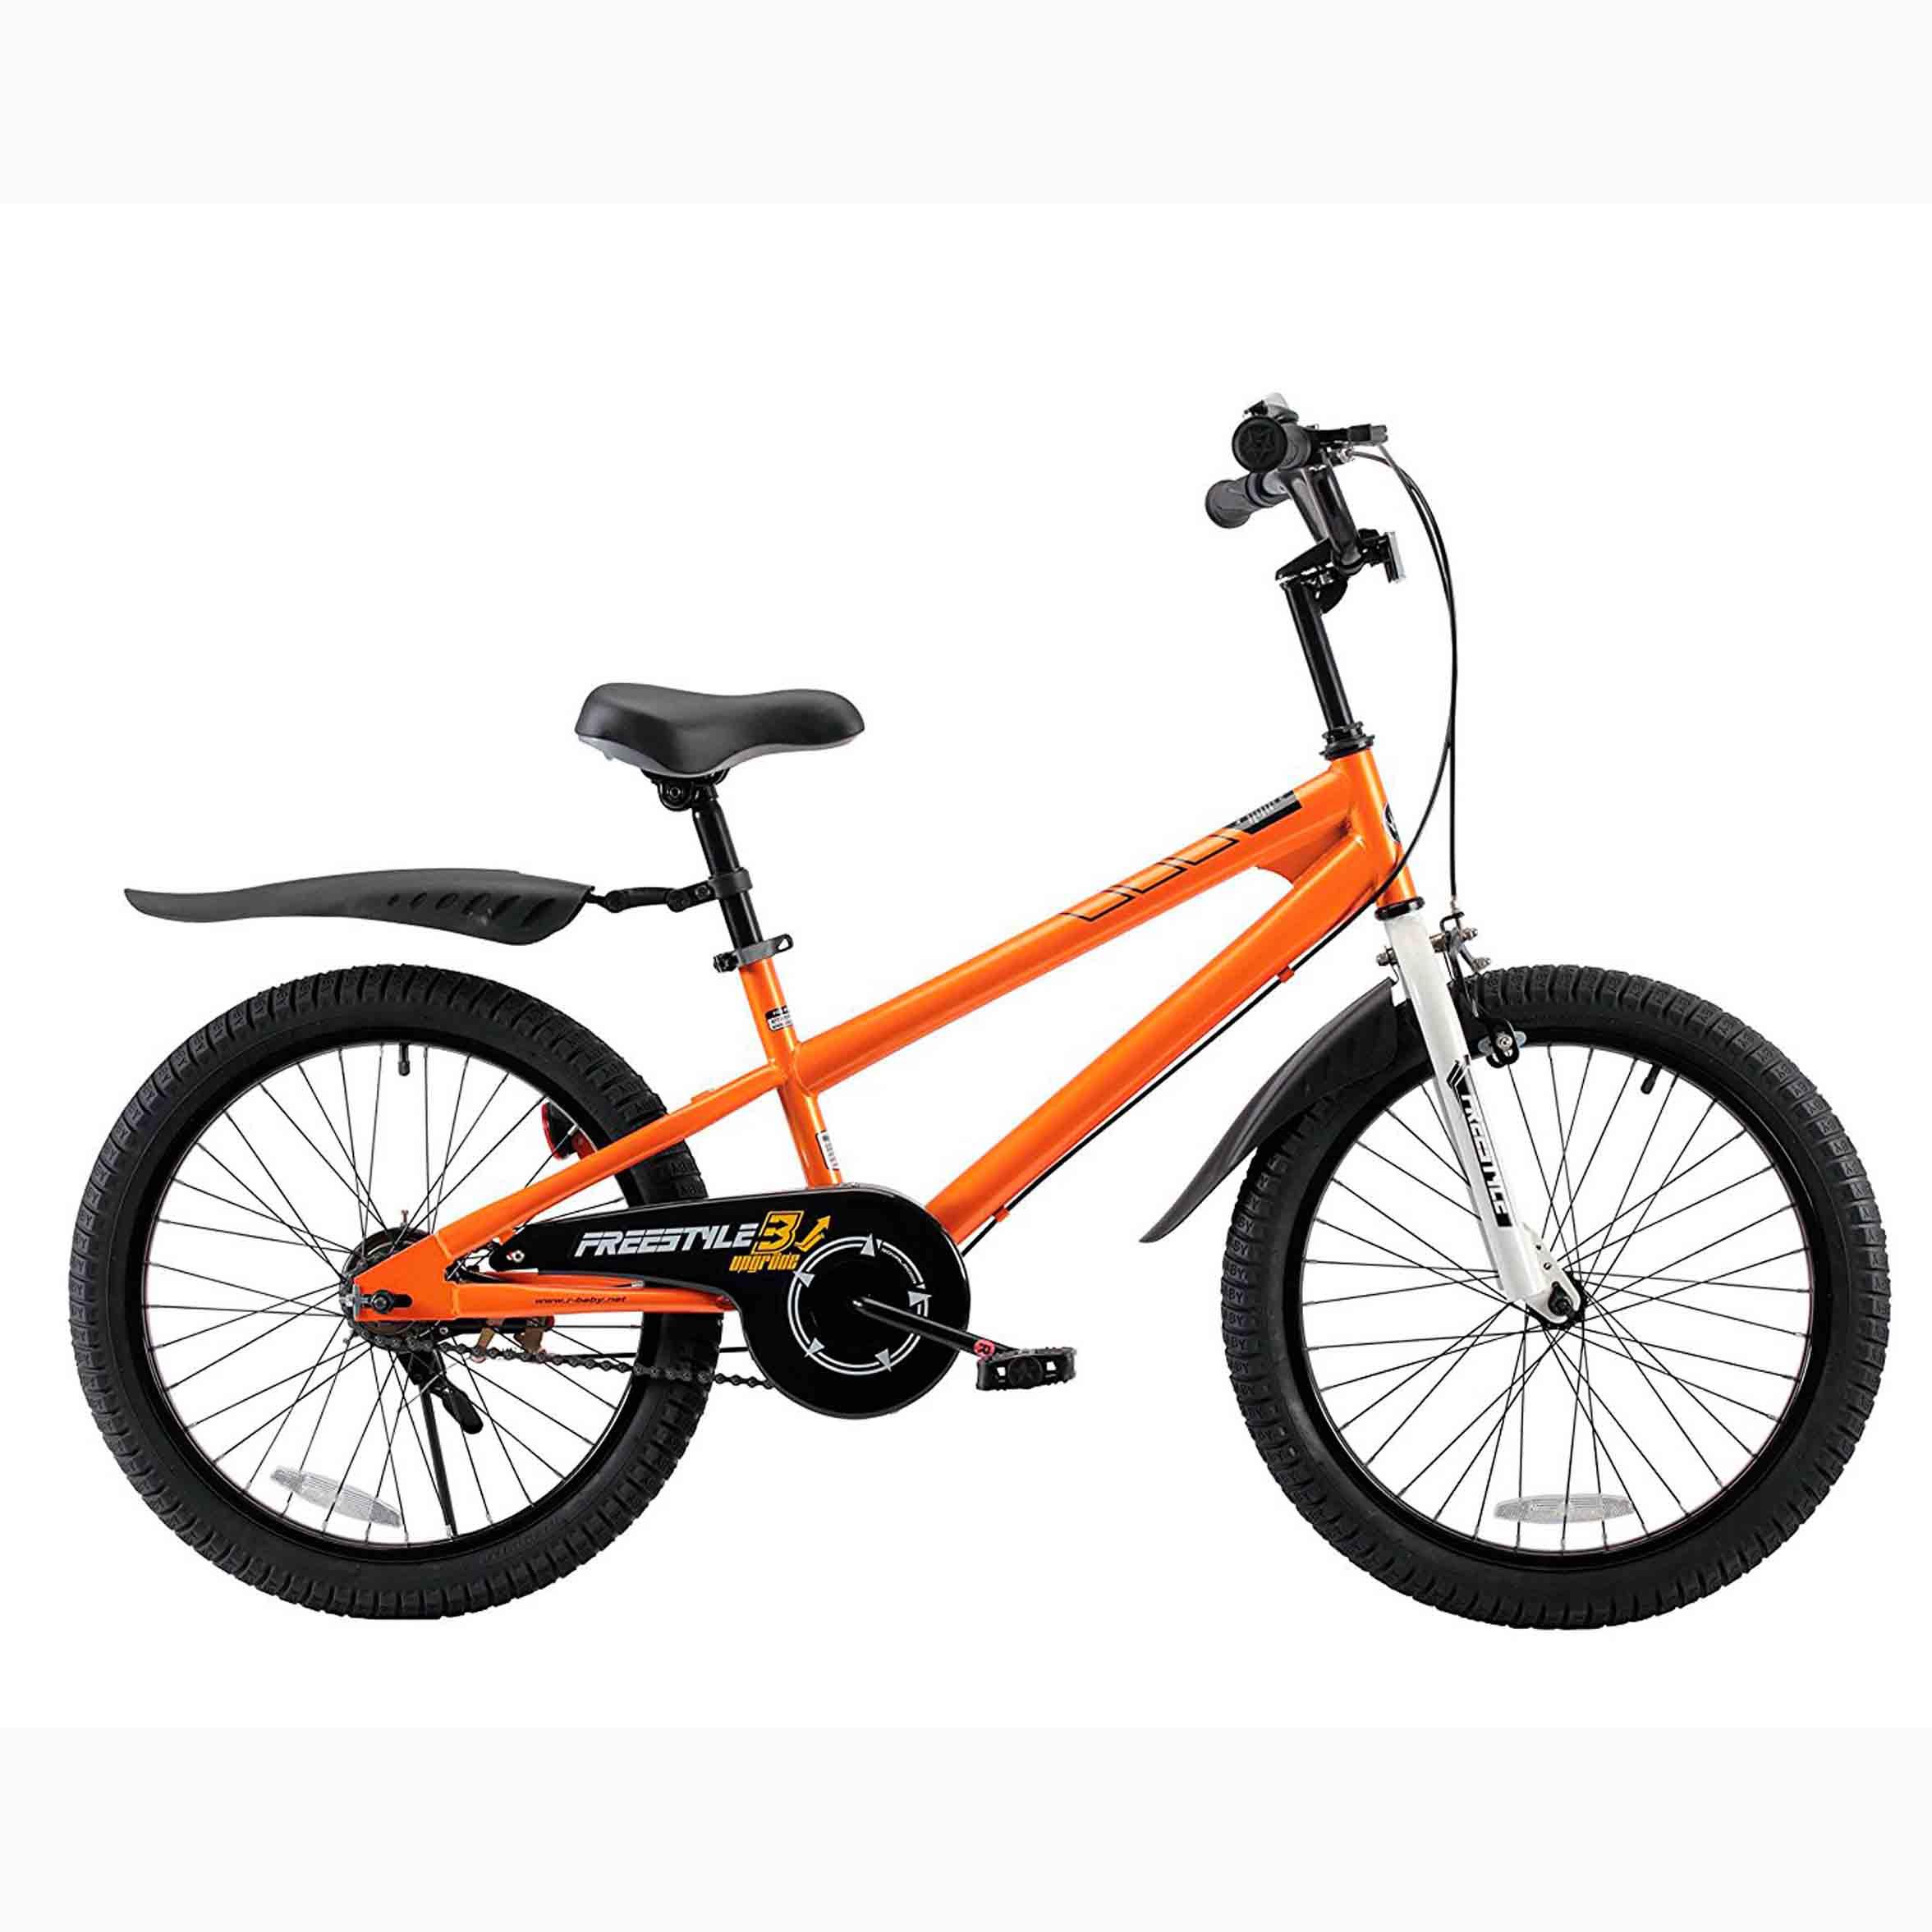 Фото Велосипед RoyalBaby FREESTYLE 20″, оранжевый